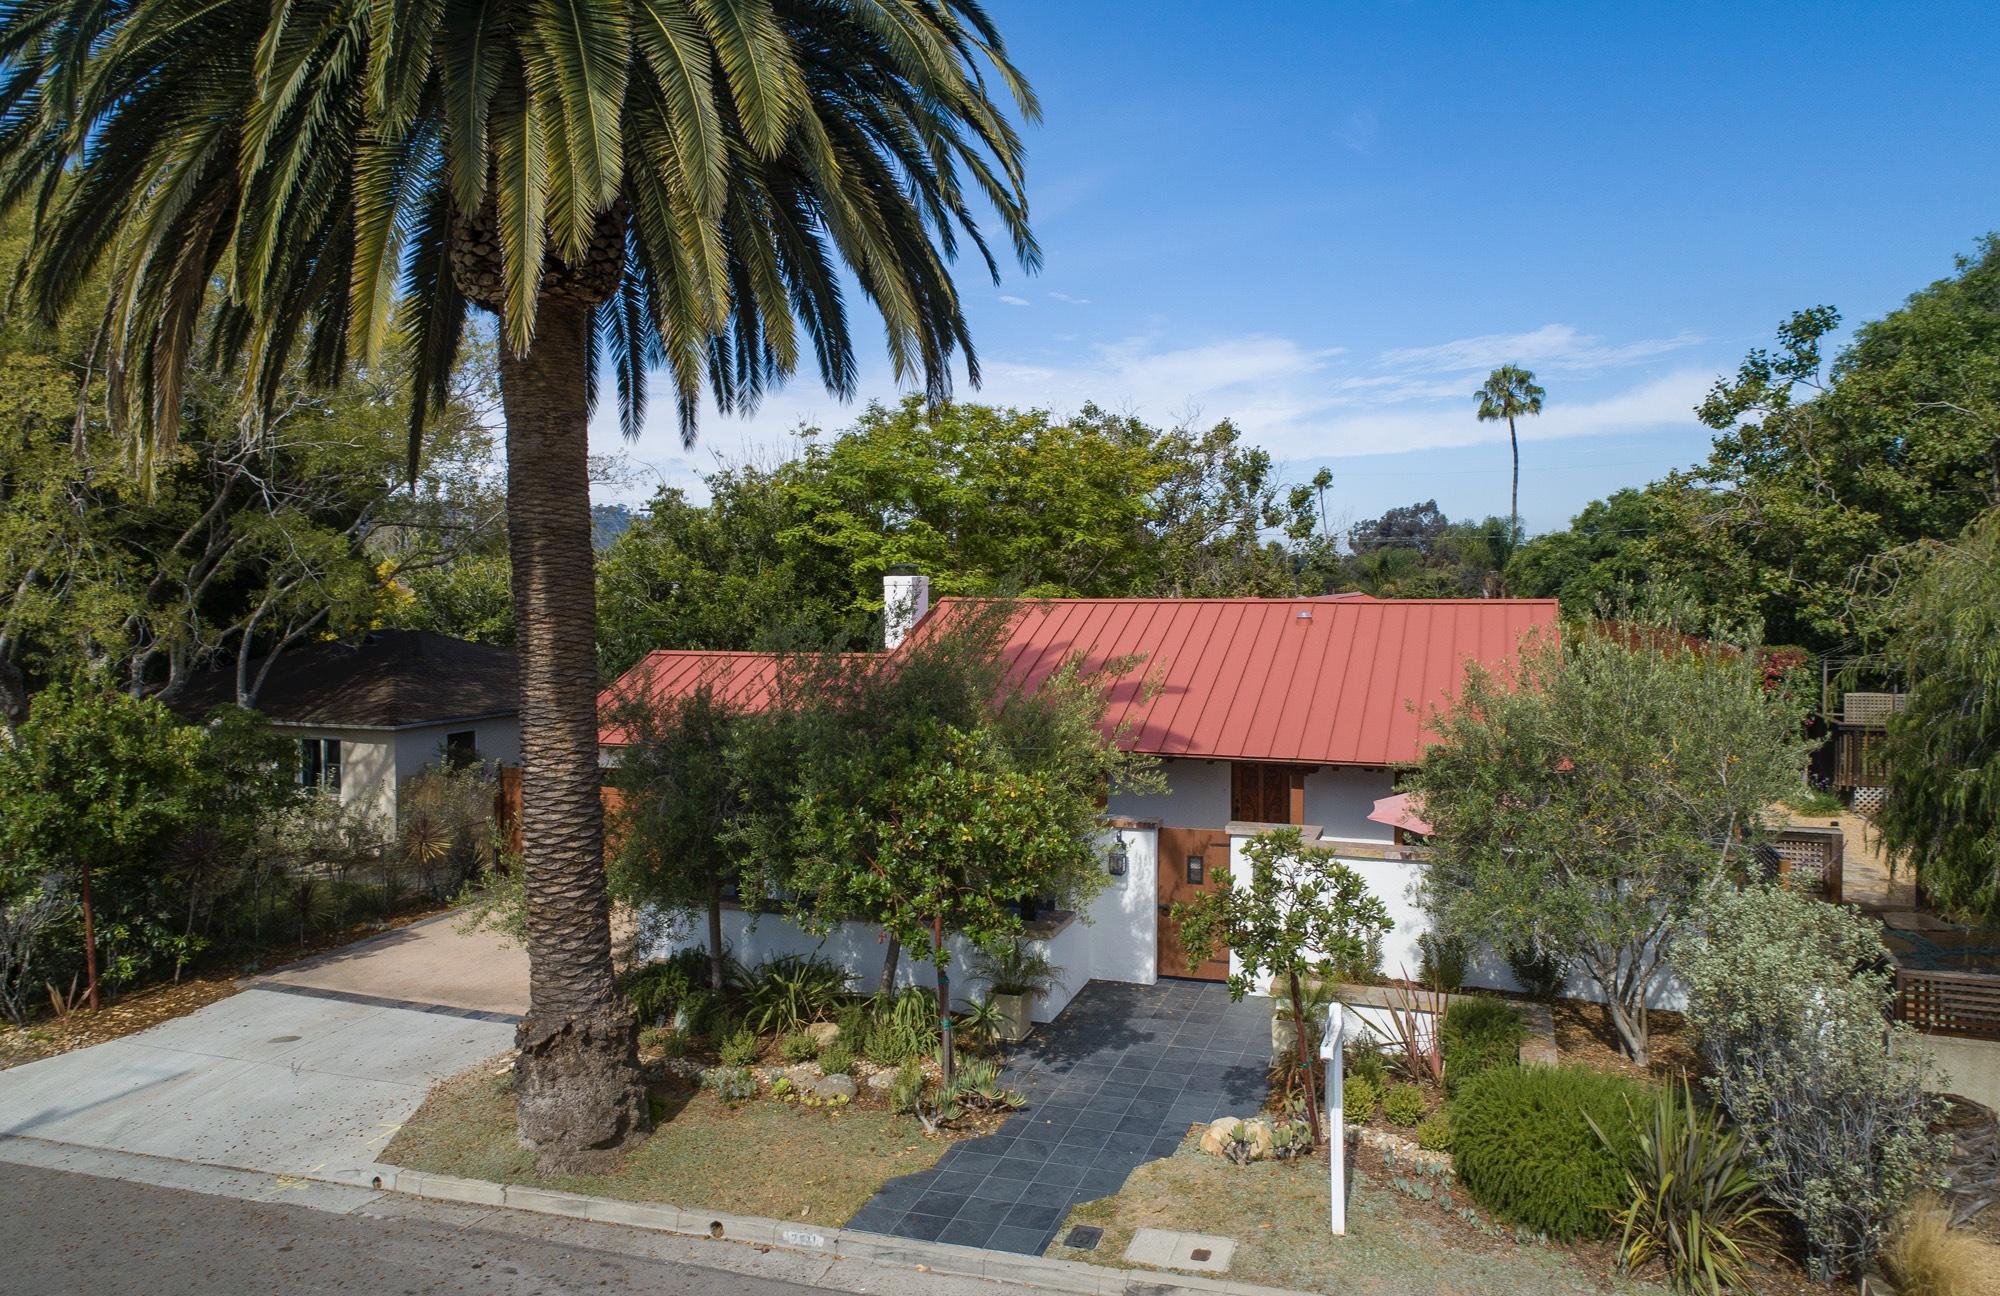 Property photo for 2611 Clinton Terrace Santa Barbara, California 93105 - 18-619